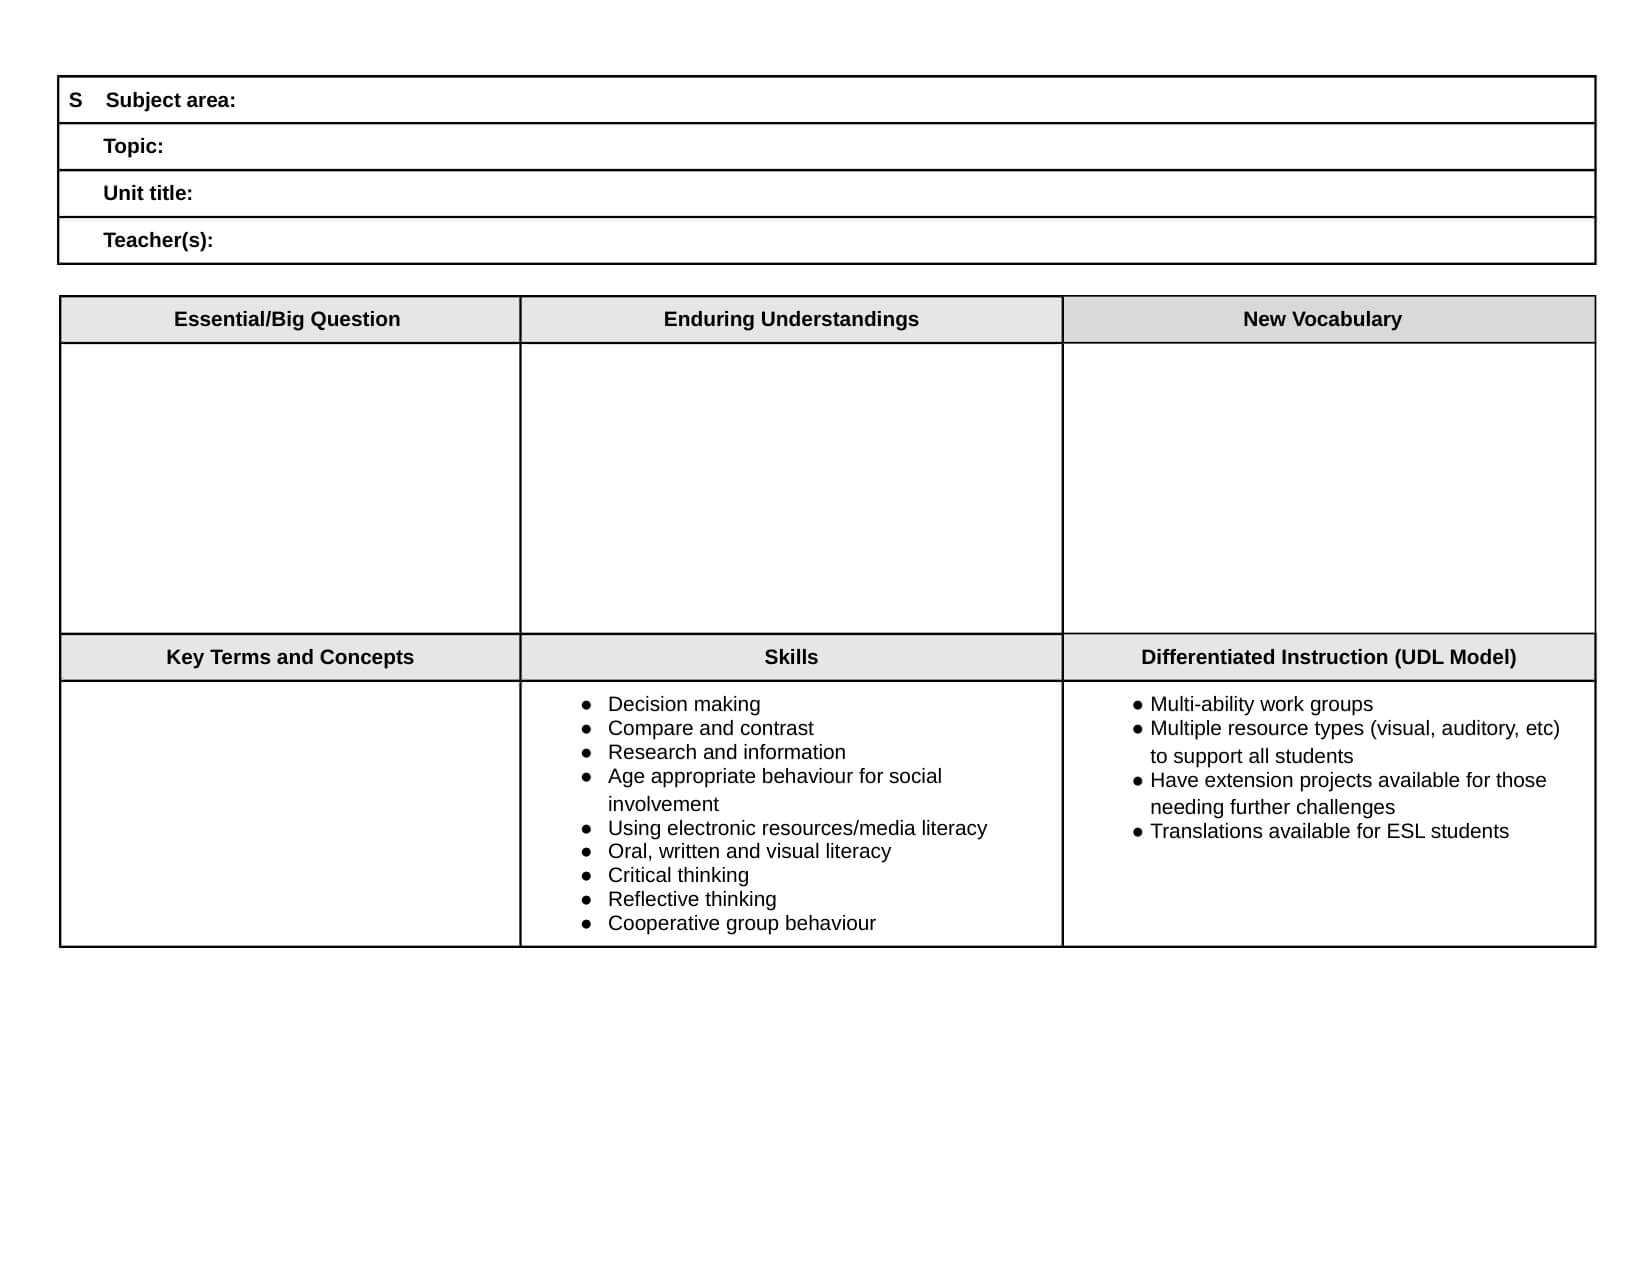 026 Blank Social Studies Lesson Plan Template Unit Plans With Regard To Blank Unit Lesson Plan Template